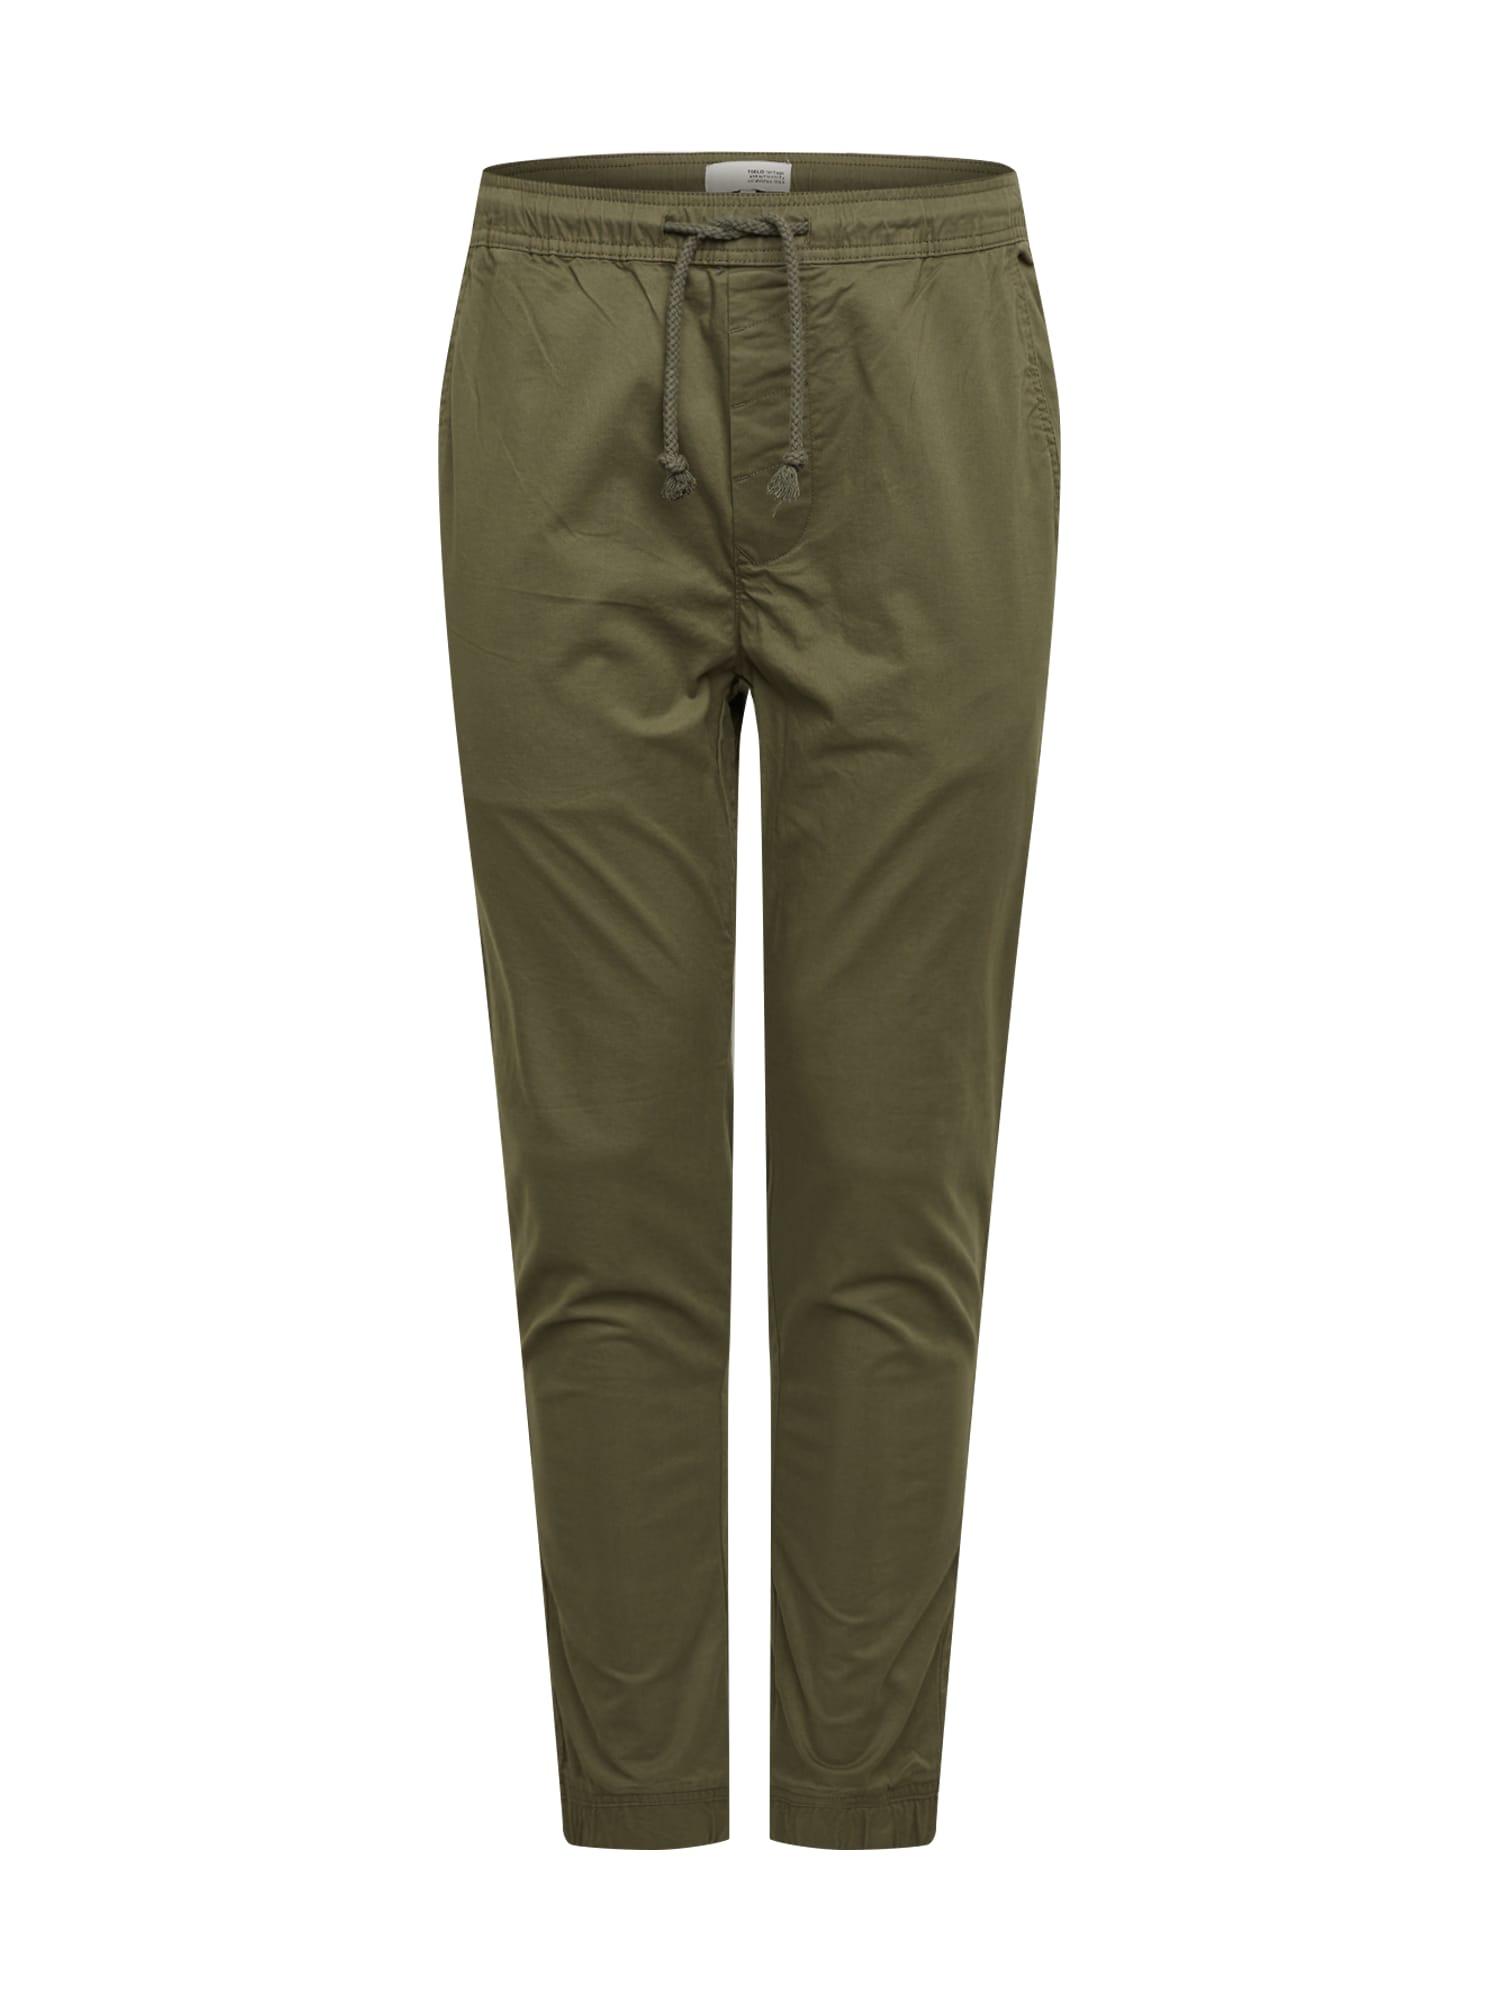 !Solid Pantalon 'Slim-Truc Cuff'  - Vert - Taille: S - male